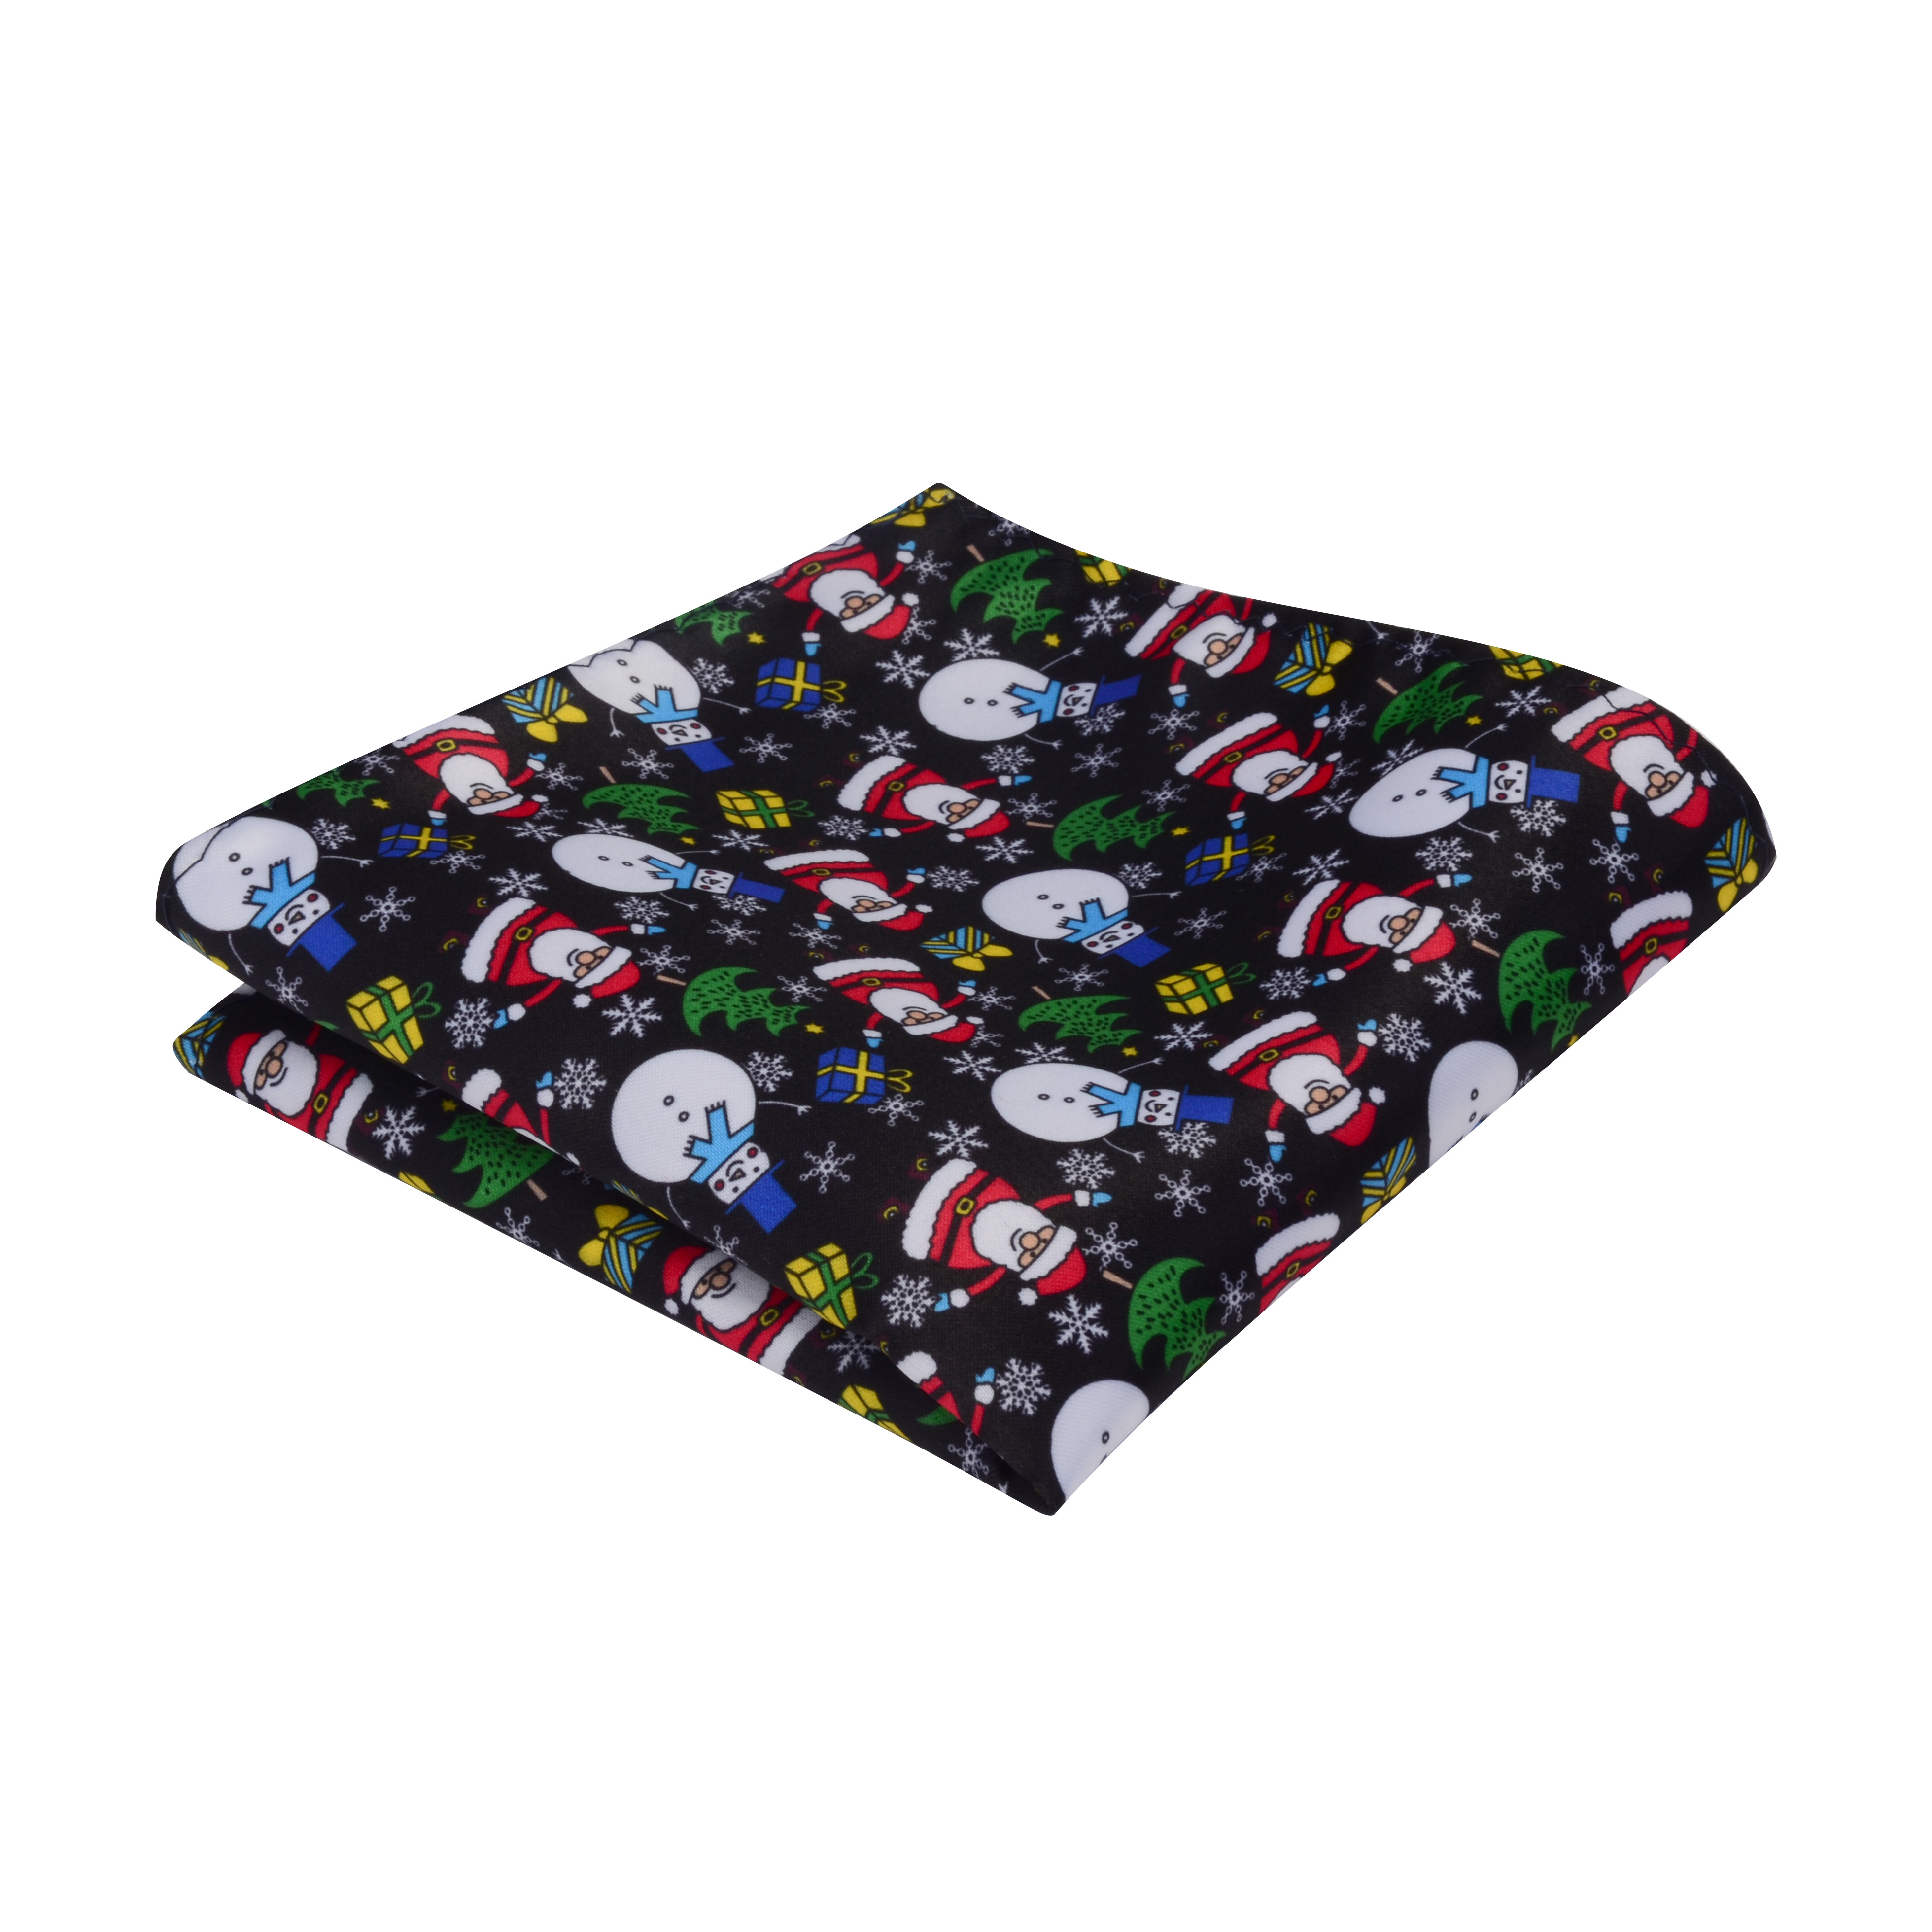 Ricnais Silk 25cm*25cm Handkerchief Yellow Red Chirstmas Tree Snowman Print Pocket Square For Men Coustomer Hanky Chirstmas Gift